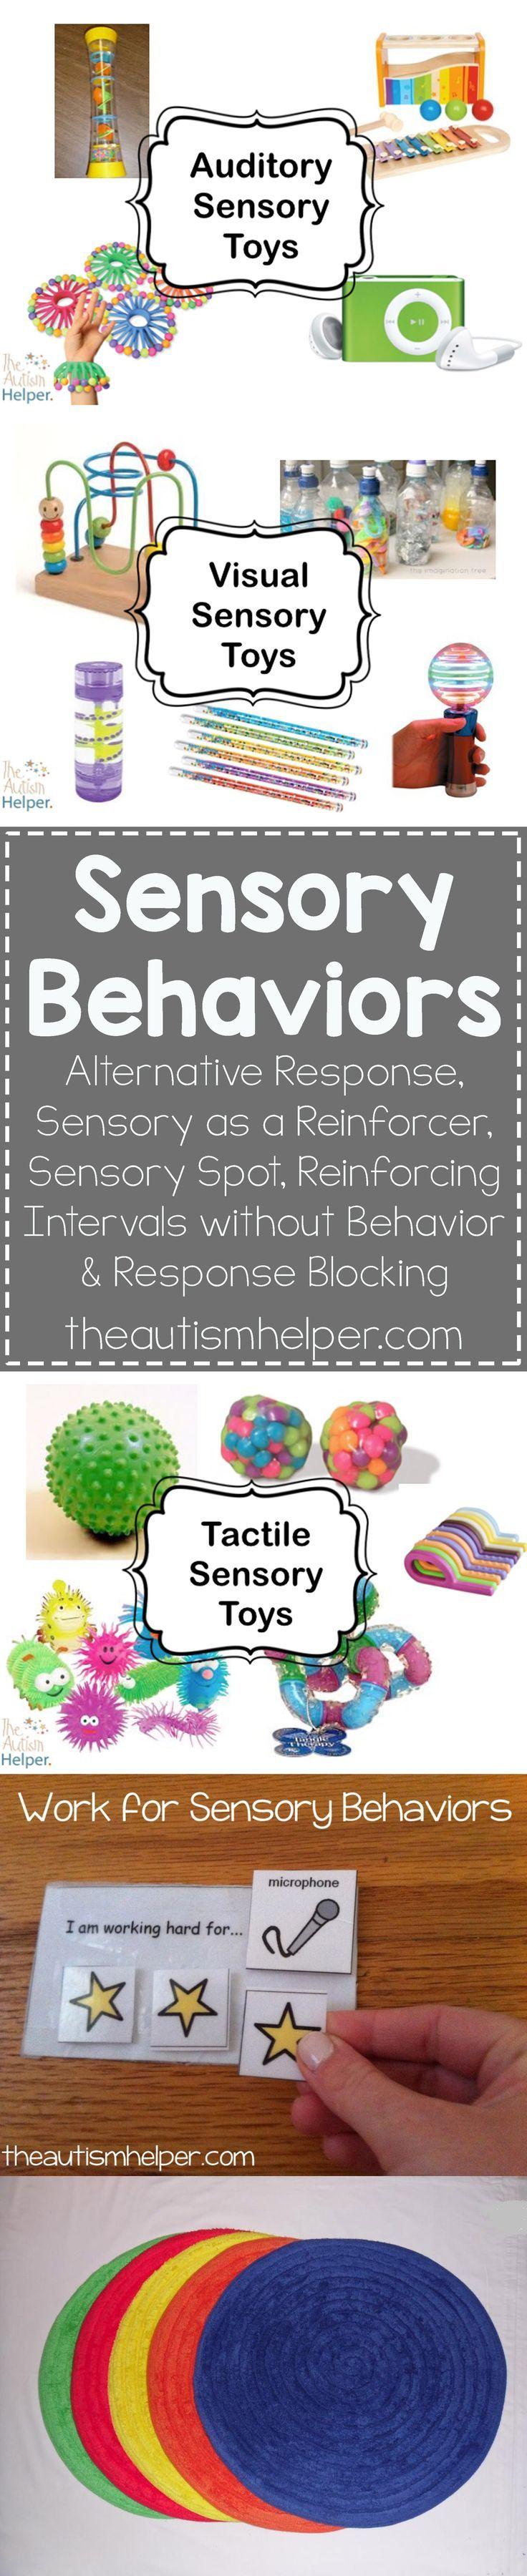 Best 25 Autism sensory activities ideas on Pinterest